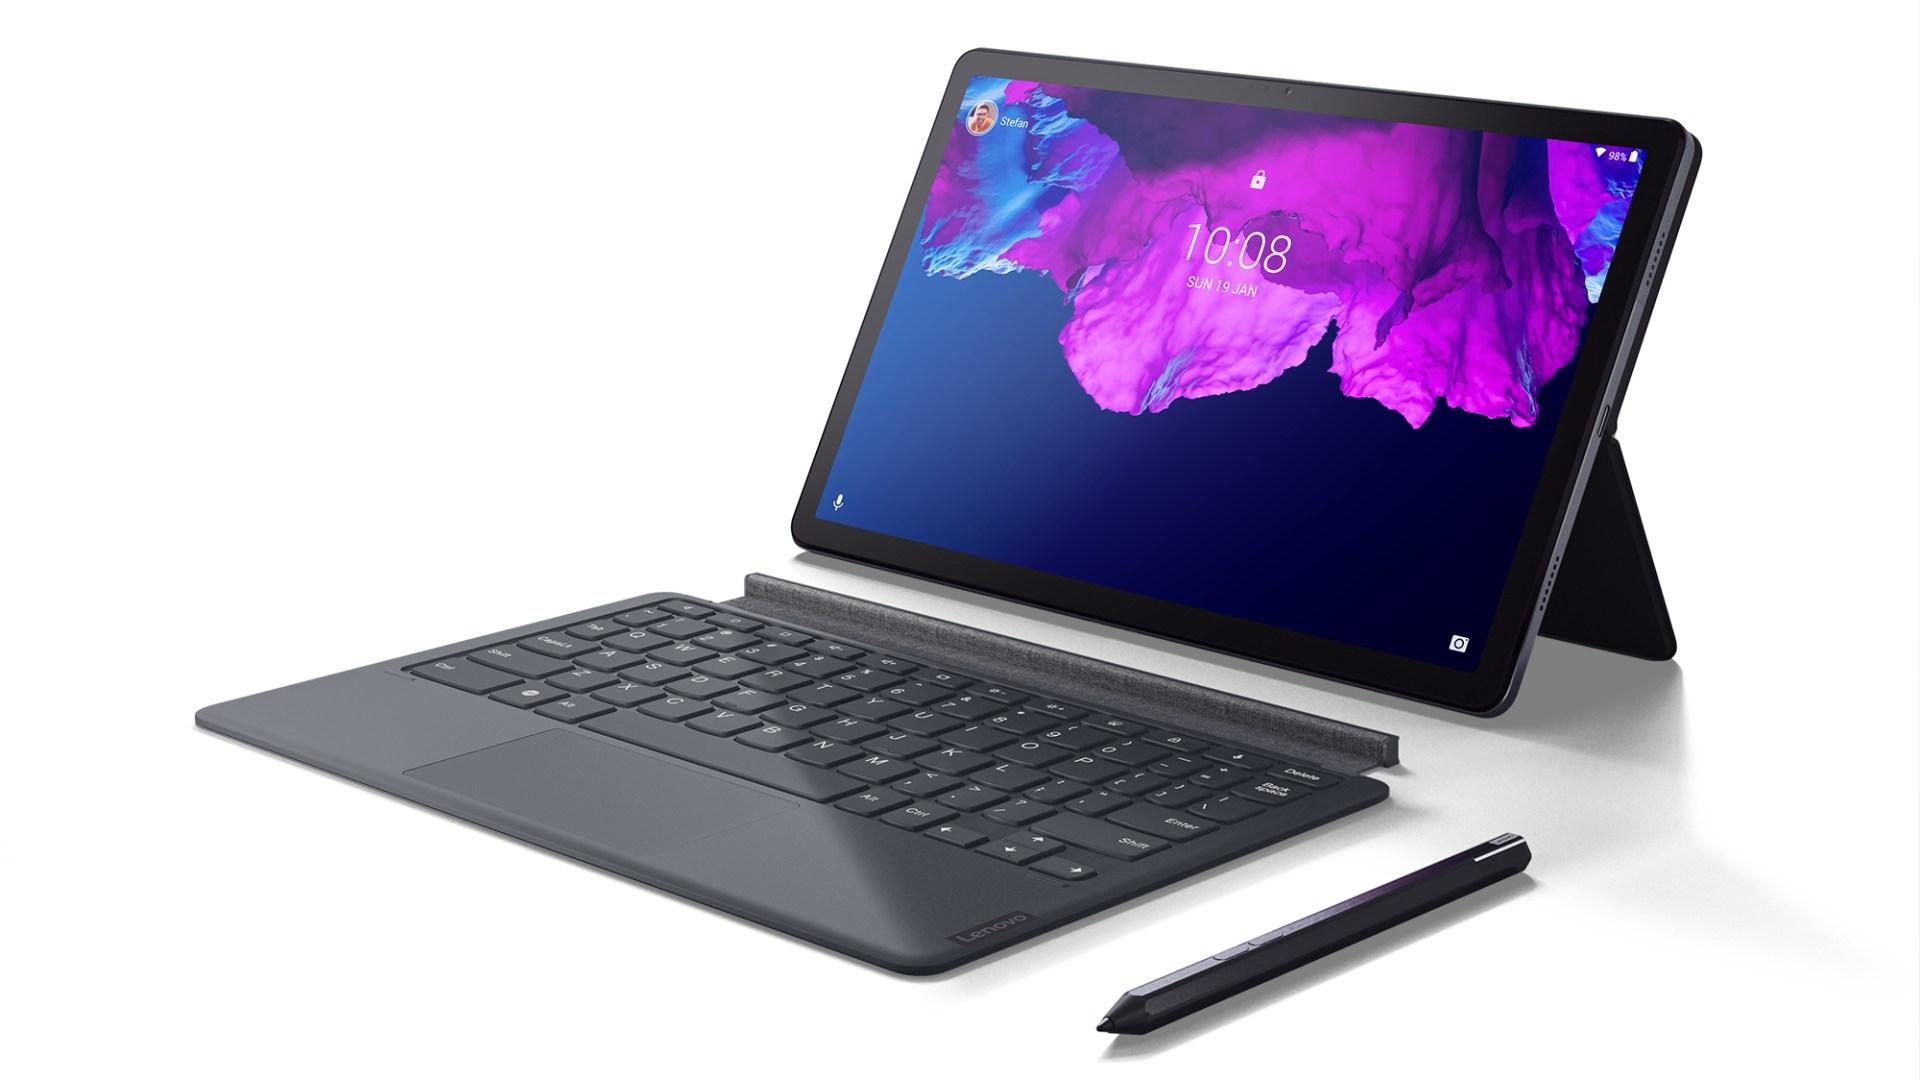 Tablet, Lenovo, Tastatur, Stylus, Stift, Lenovo Tab P11, Surface-Klon